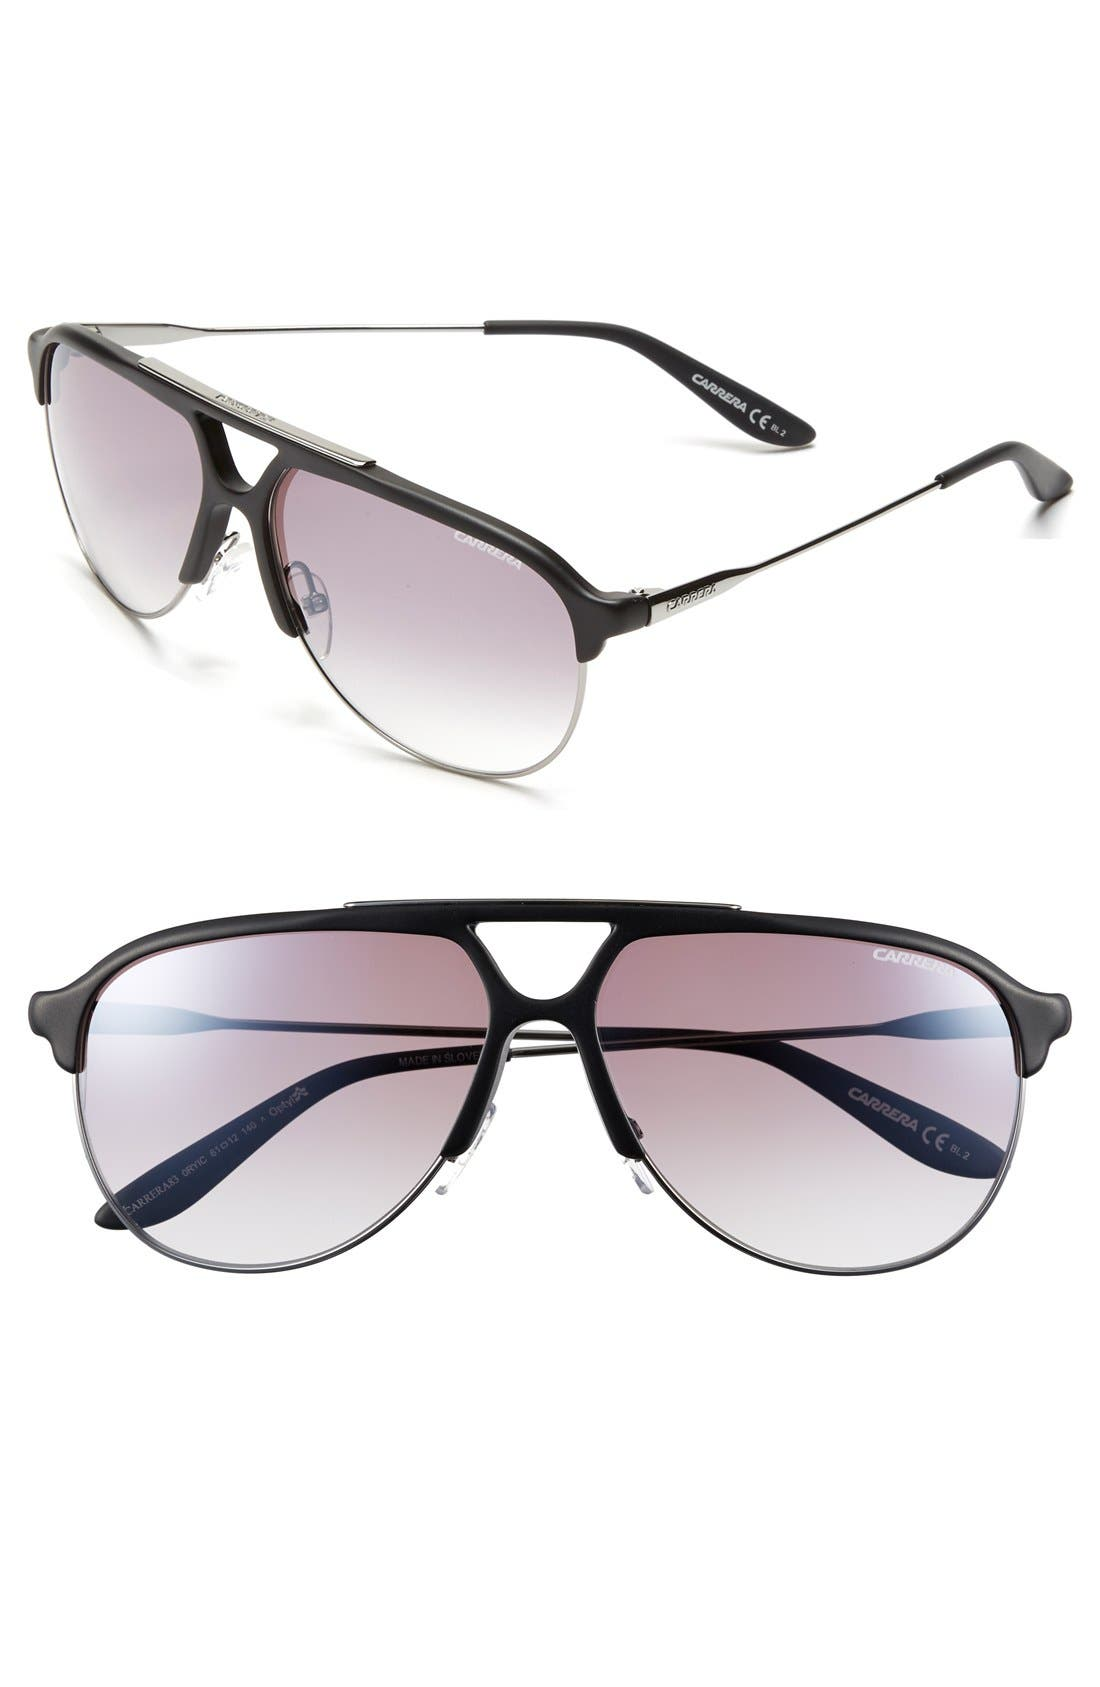 Main Image - Carrera Eyewear 61mm Optyl™ Sunglasses